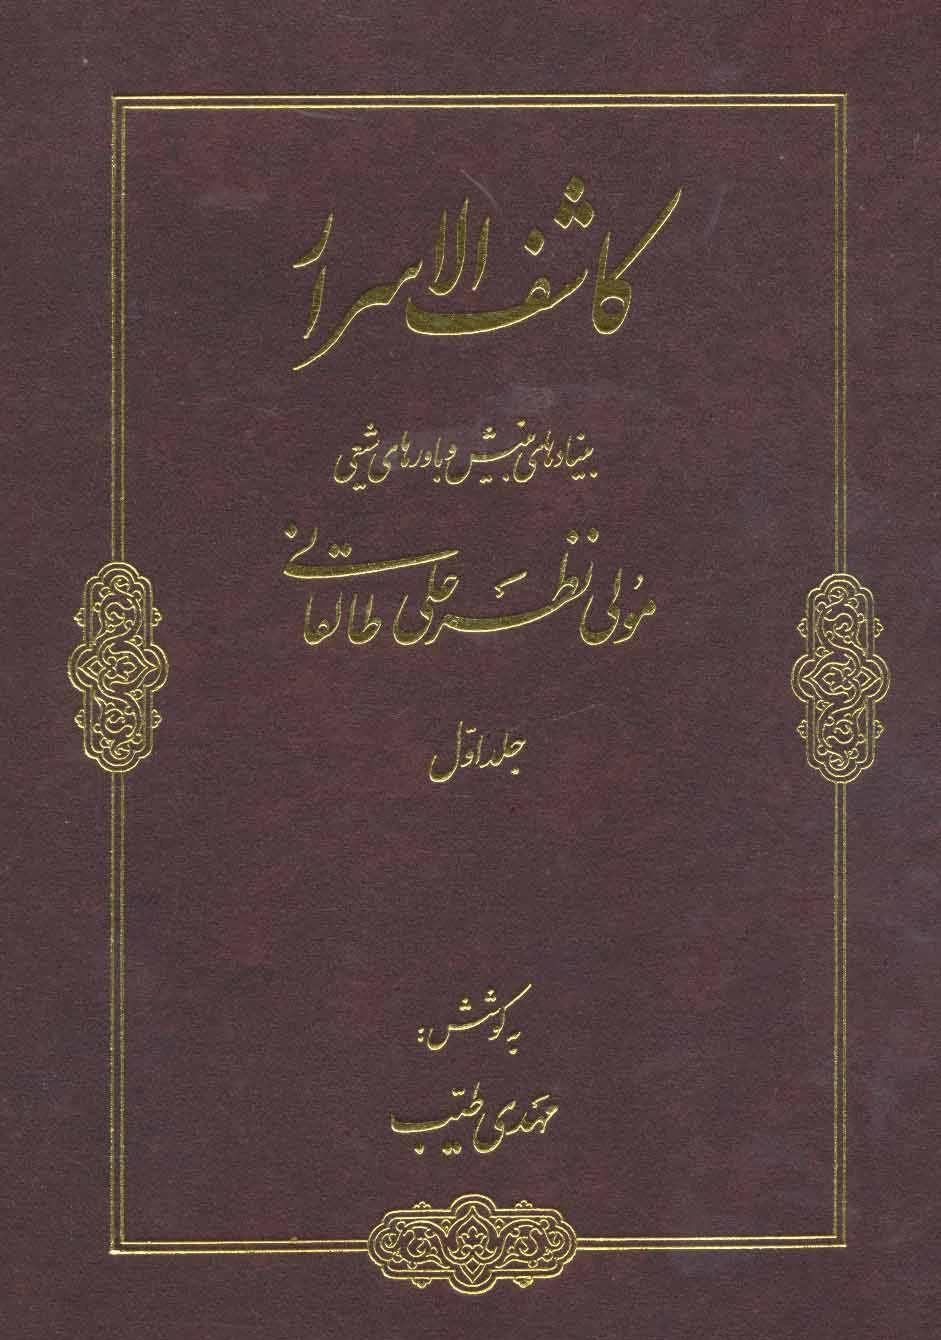 کتاب کاشف الاسرار (۲جلدی)